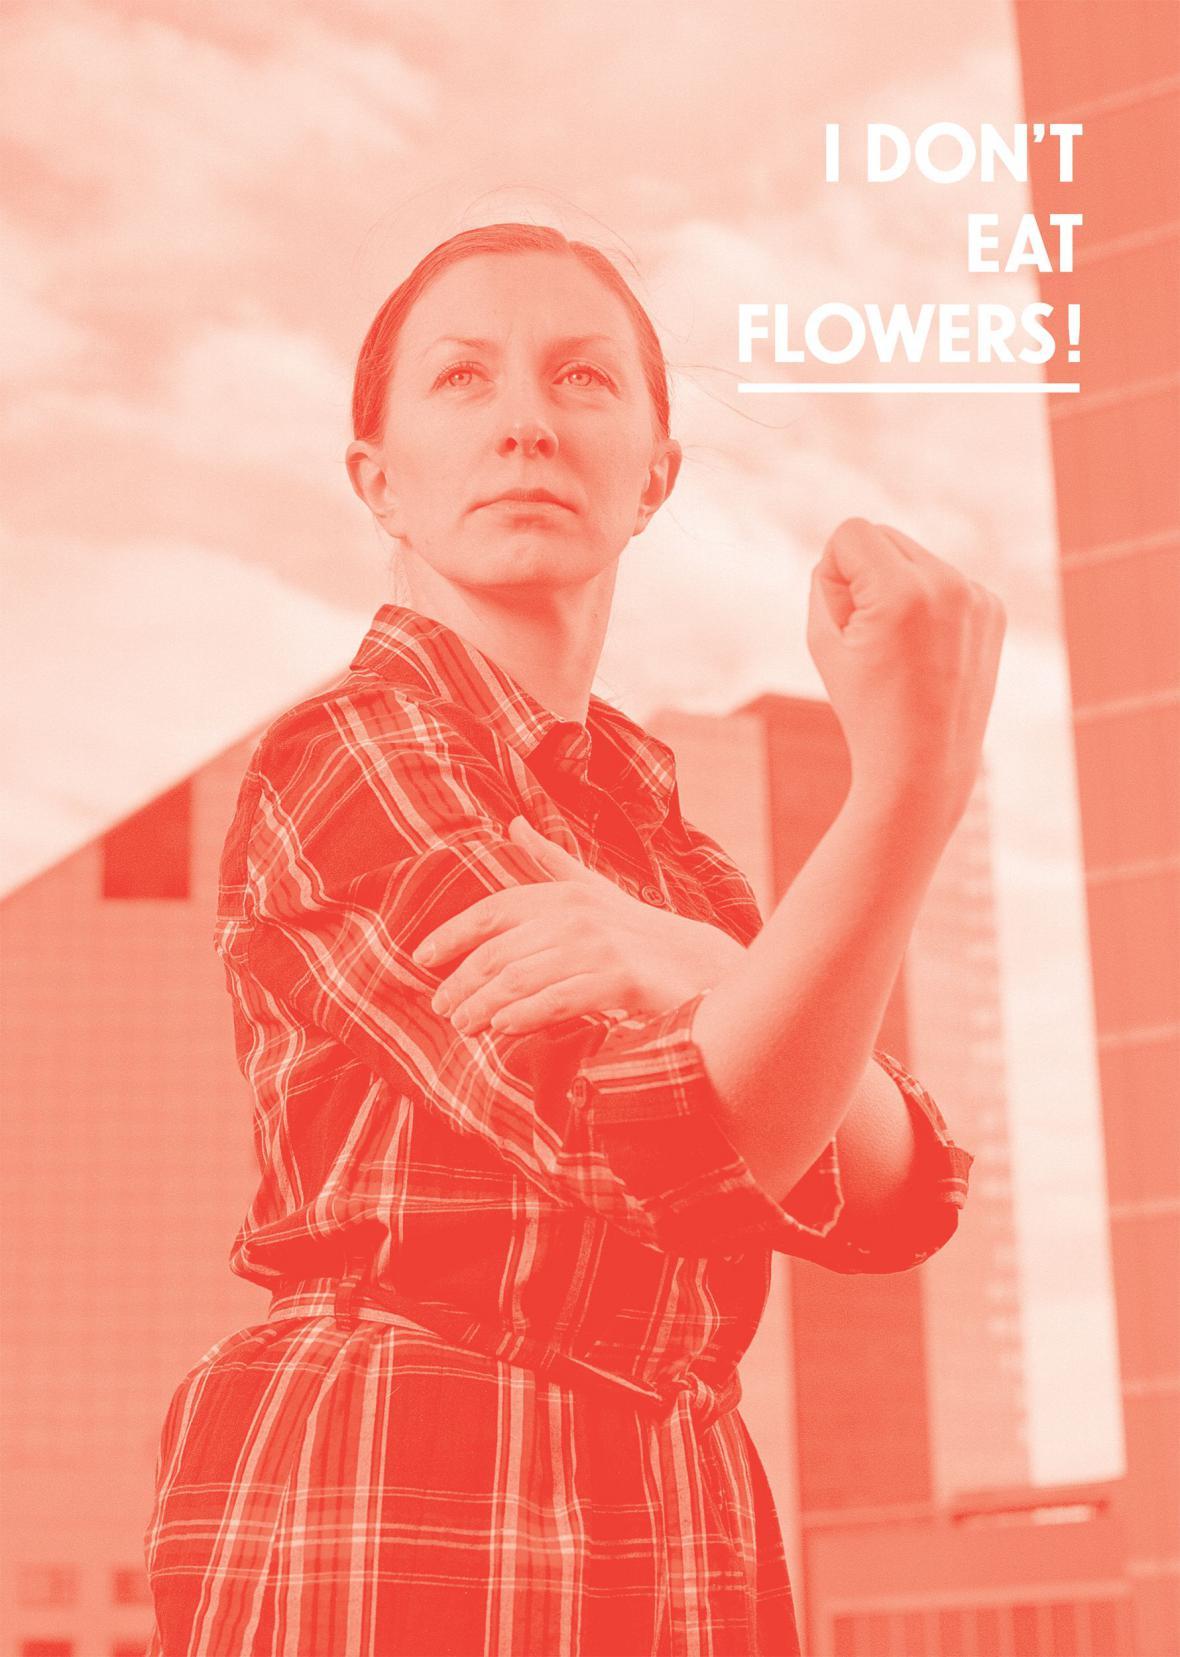 Marge Monko / I Don't Eat Flowers, 2011